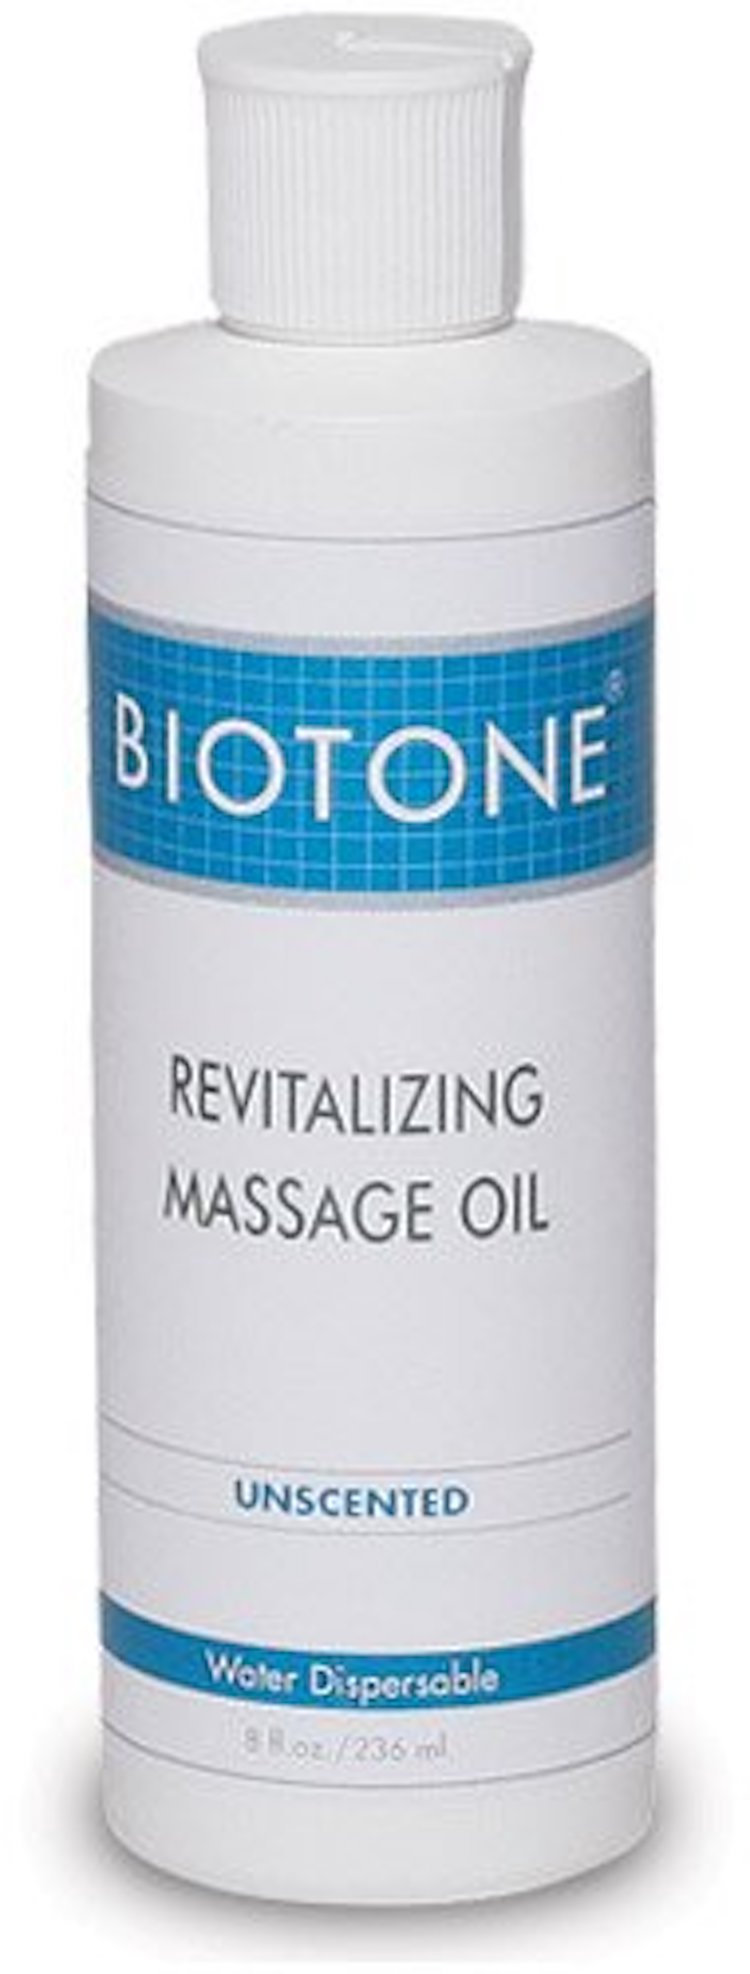 Biotone Revitalizing Massage Oil Unscented